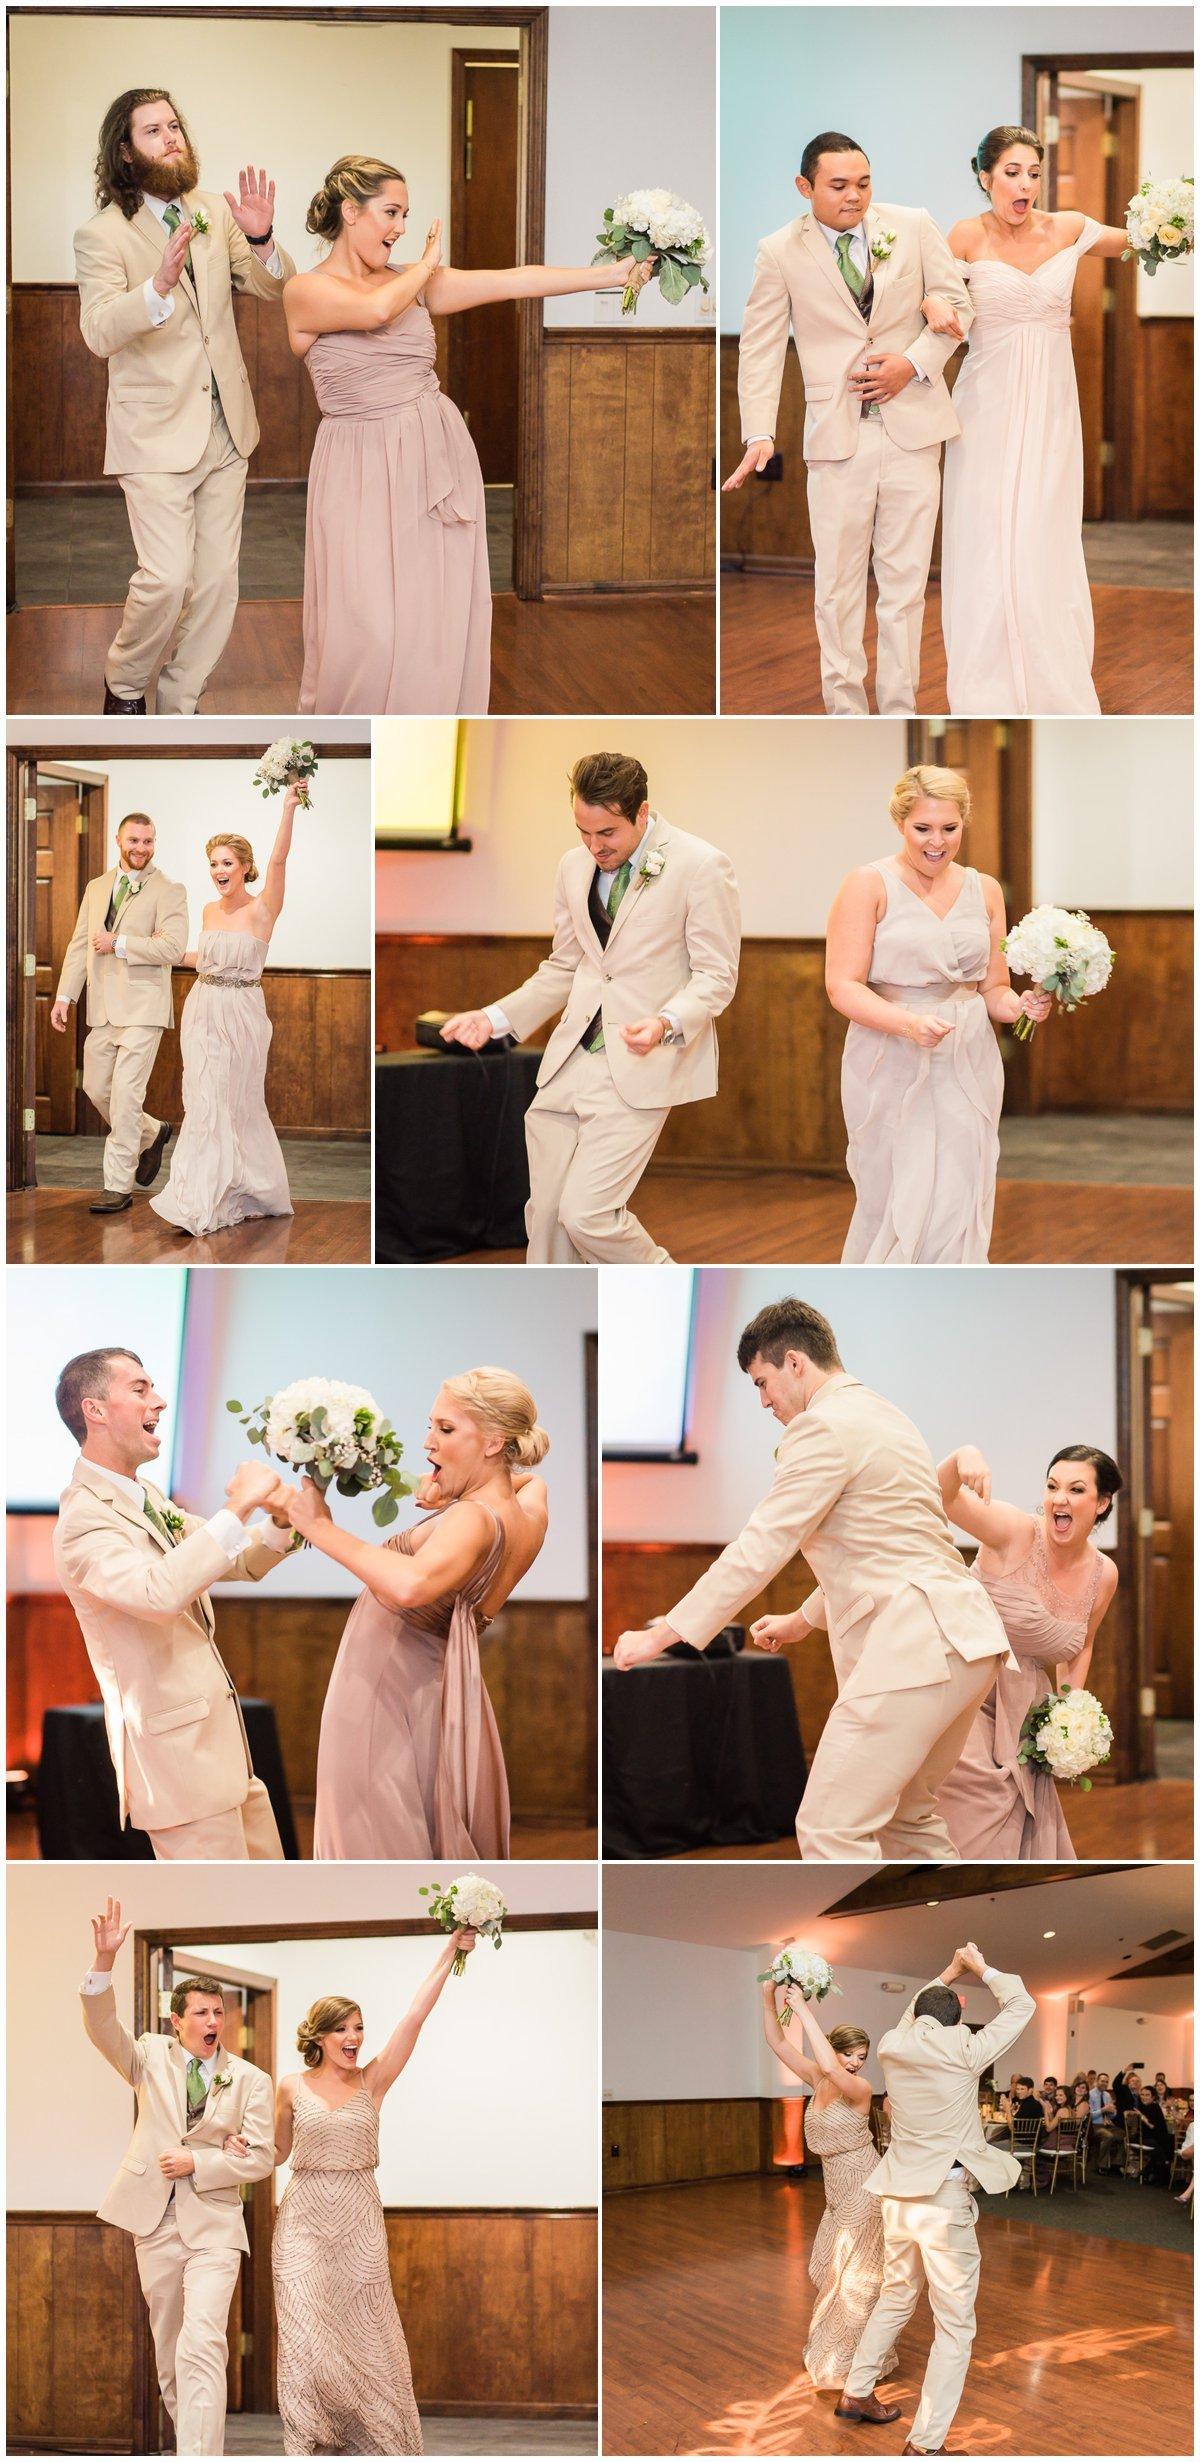 Becca-Tony-Houston-Wedding-The Admiral on Clear Lake 63